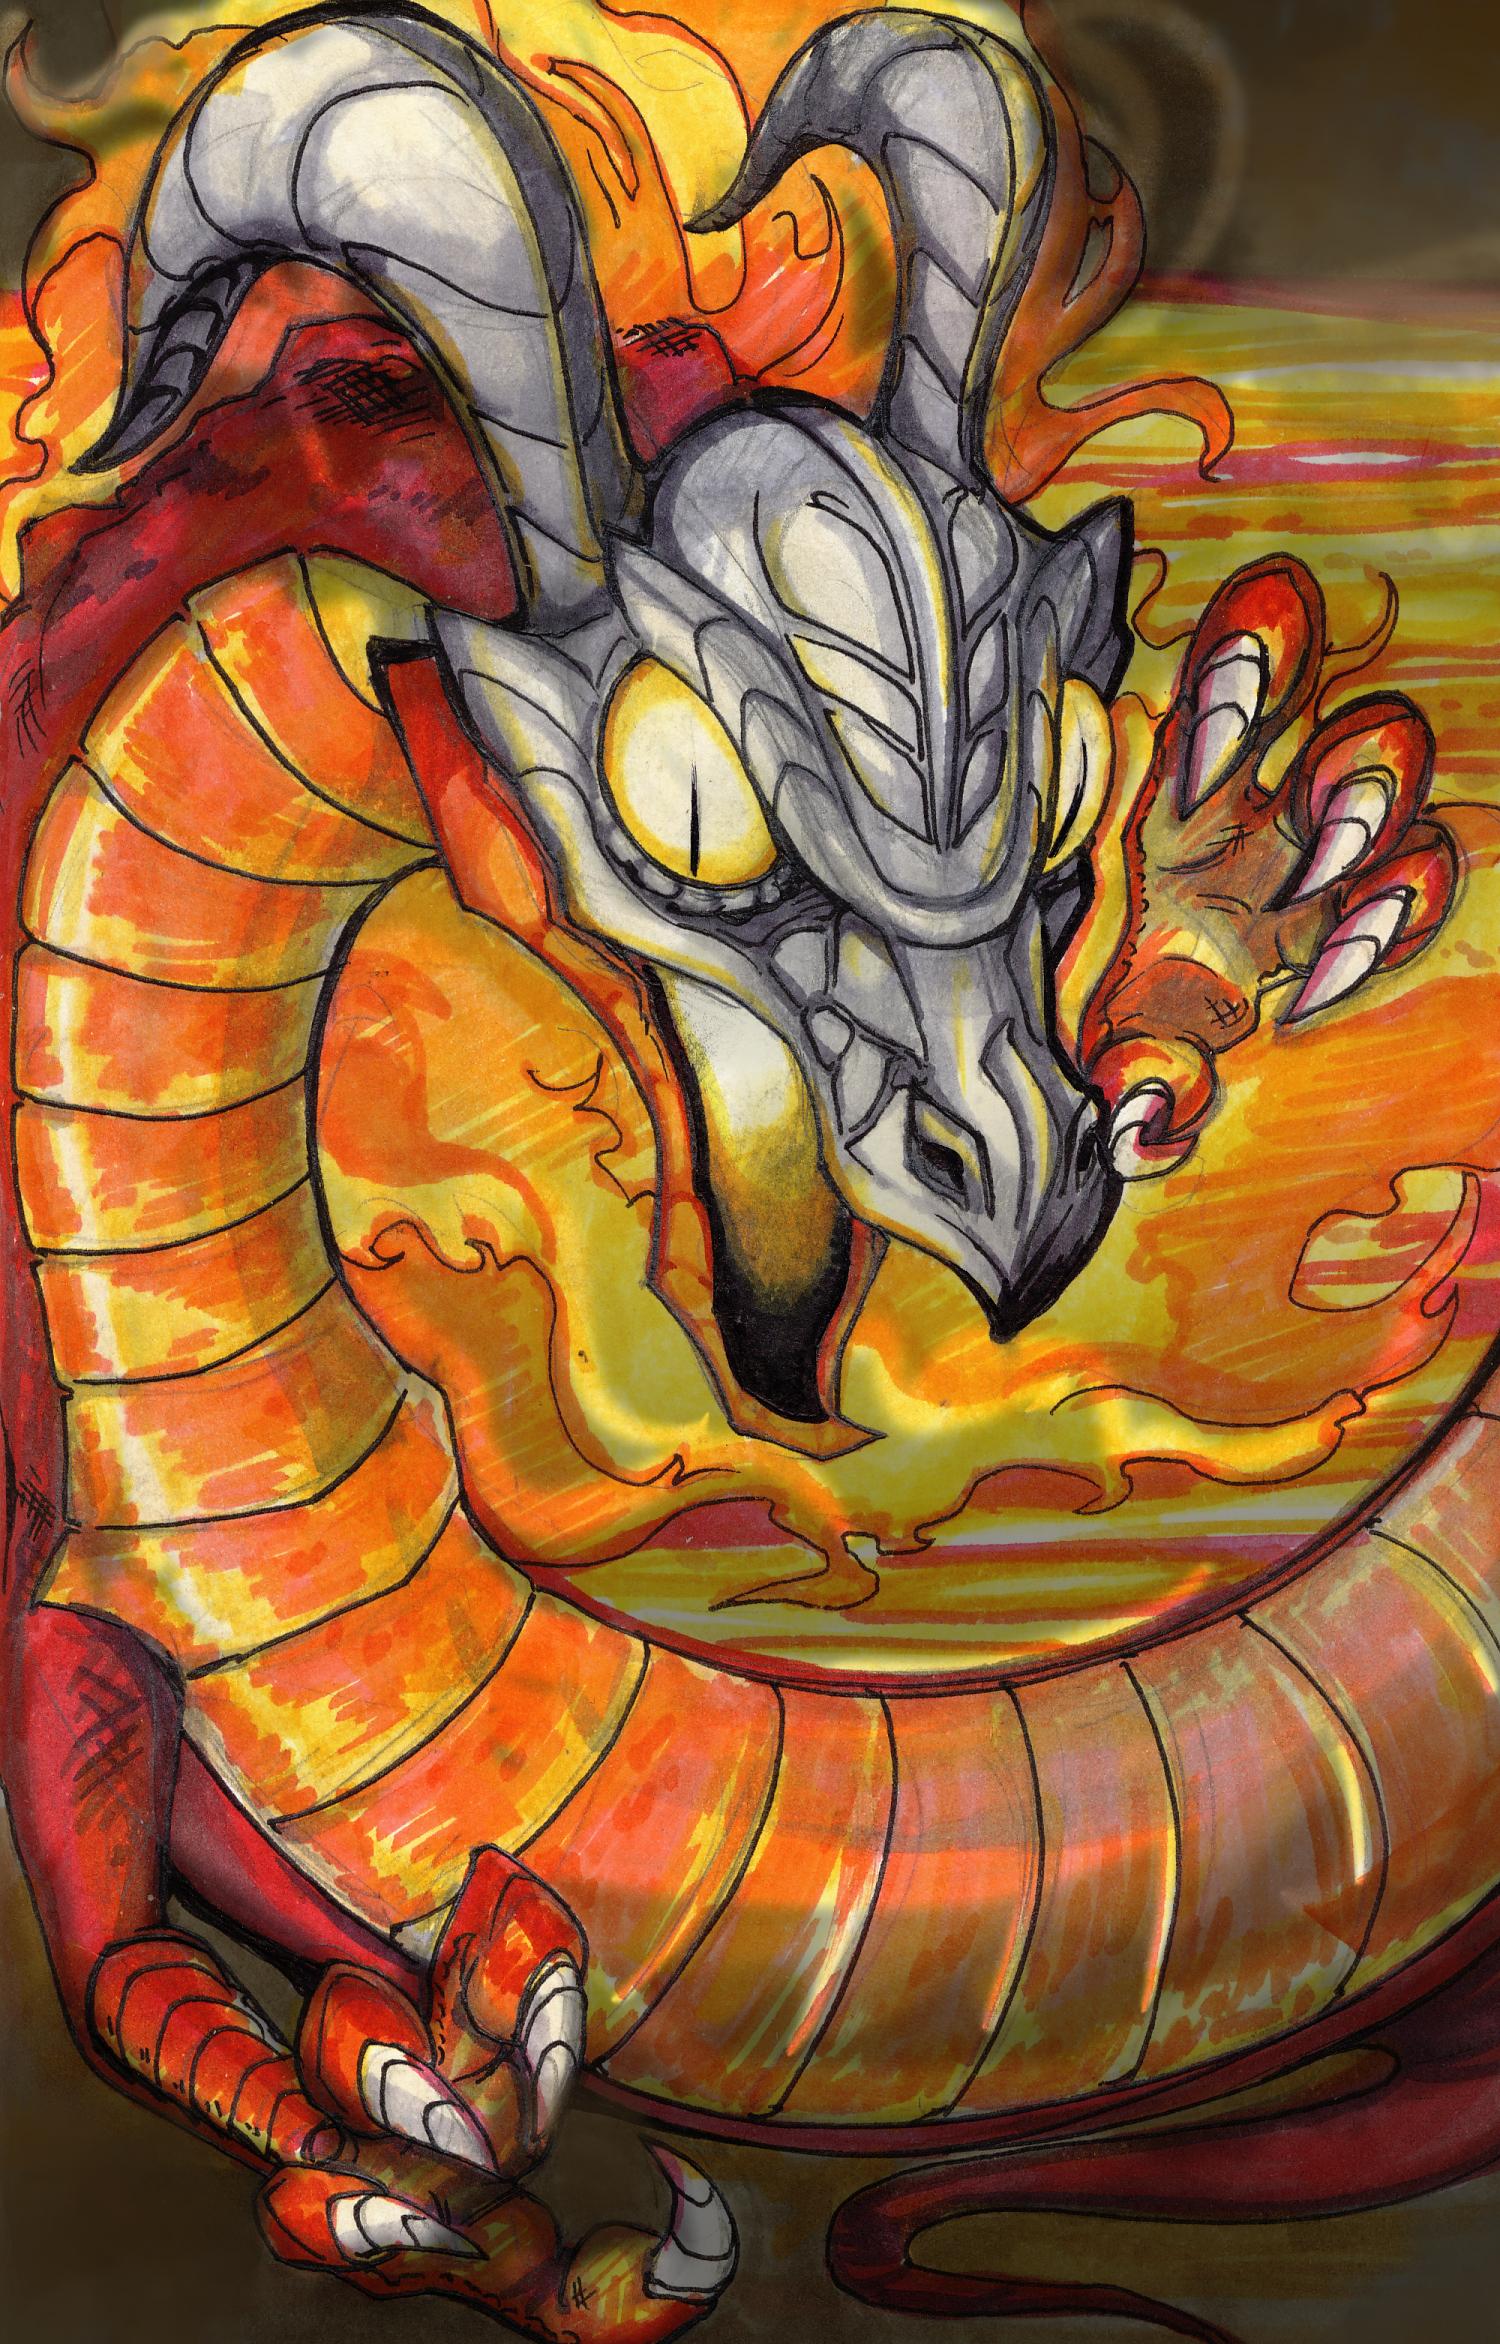 Volvagia - Fire Temple Boss